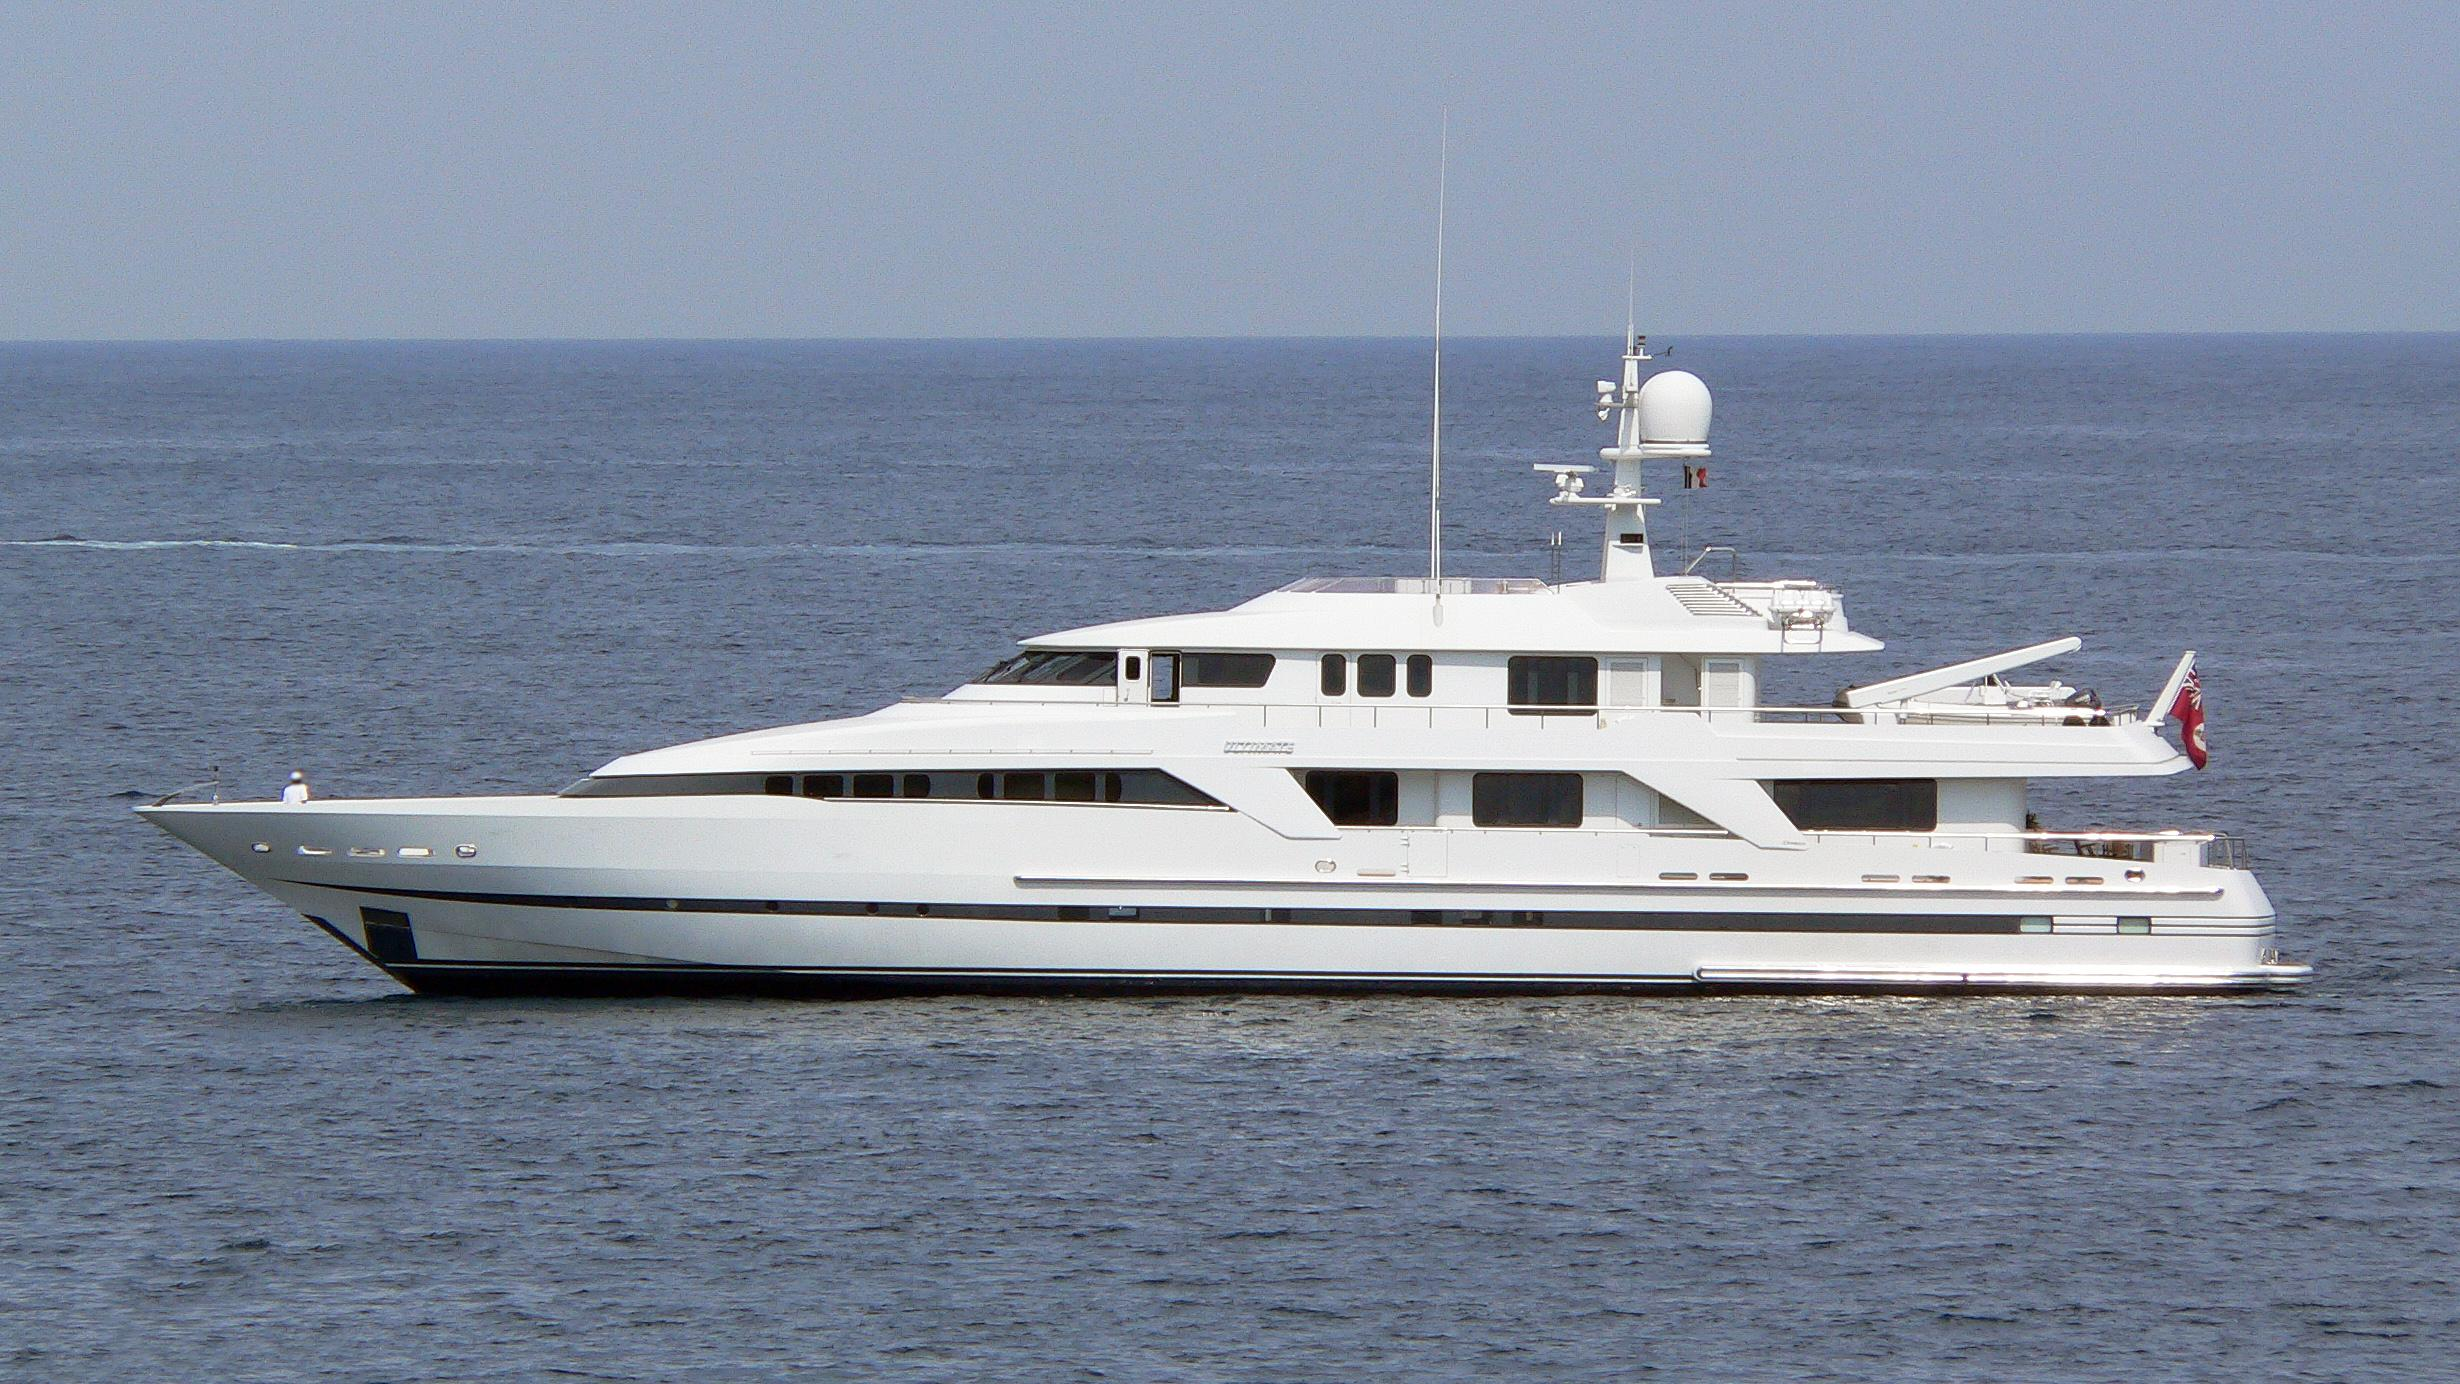 deep-blue-ii-motor-yacht-oceanco-1996-44m-profile-before-refit